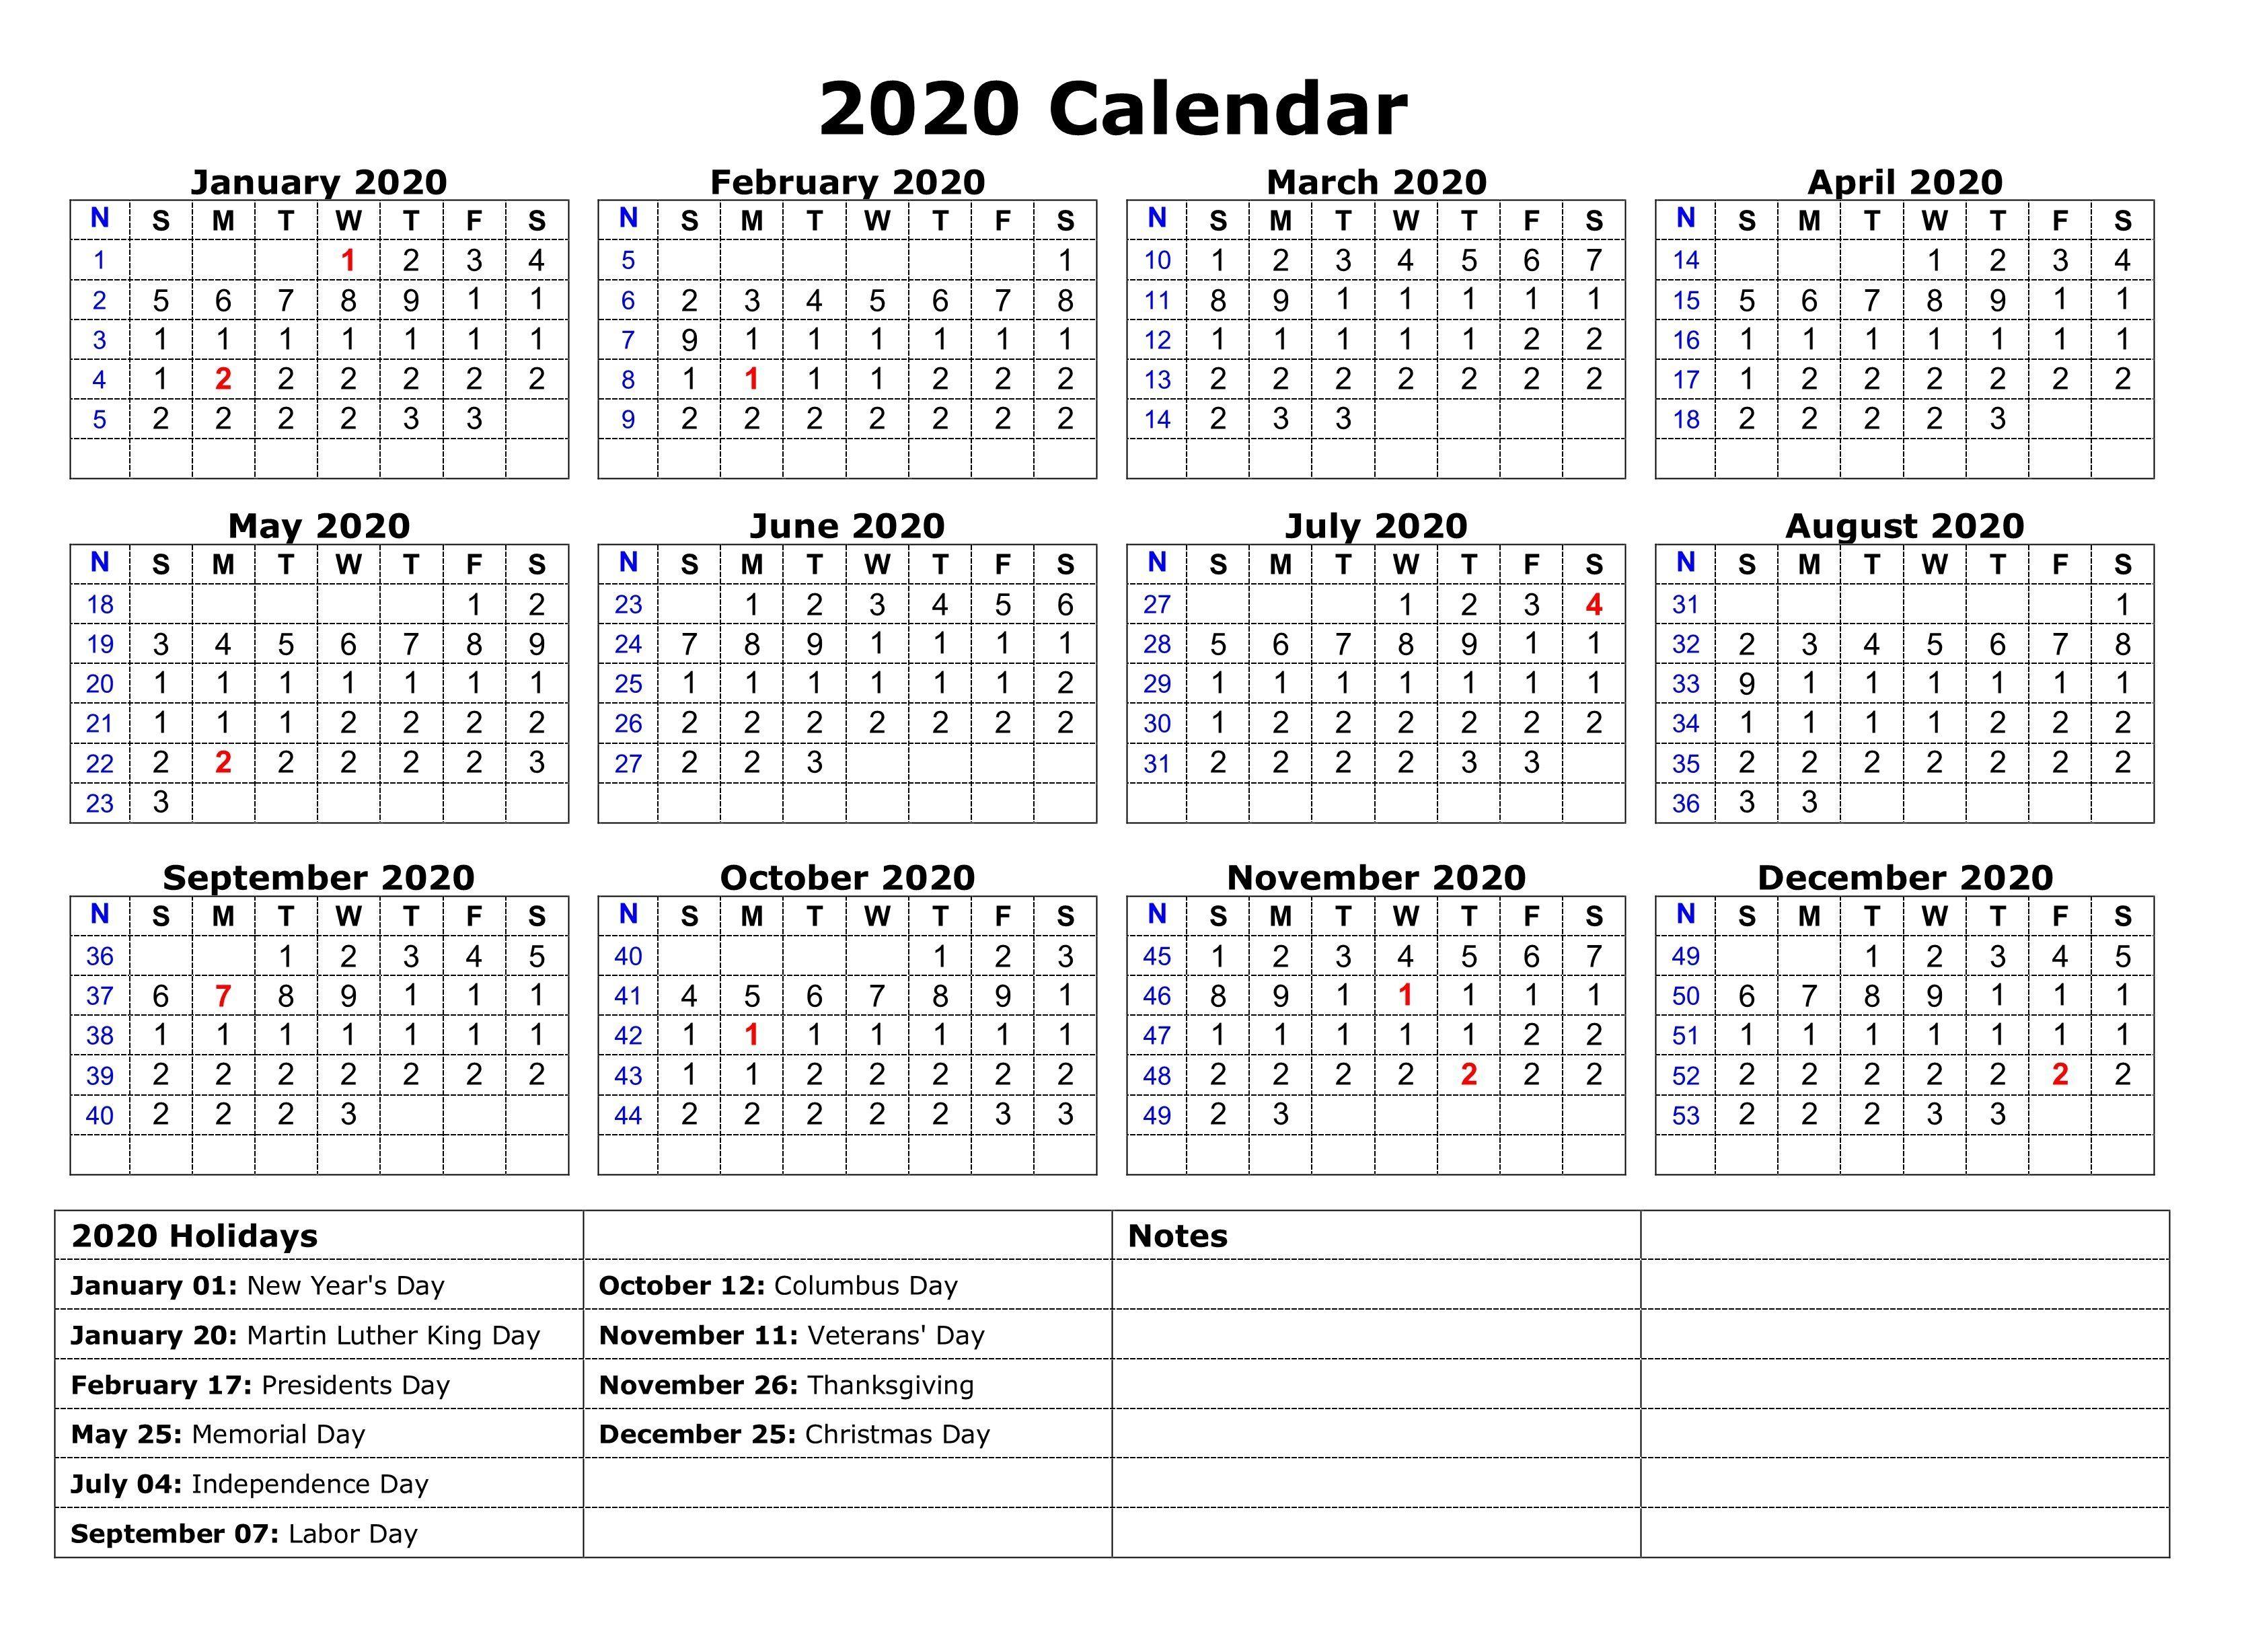 Printable 2020 One Page Holidays Calendar | November regarding 2020 Calendar With Holidays Printable Free